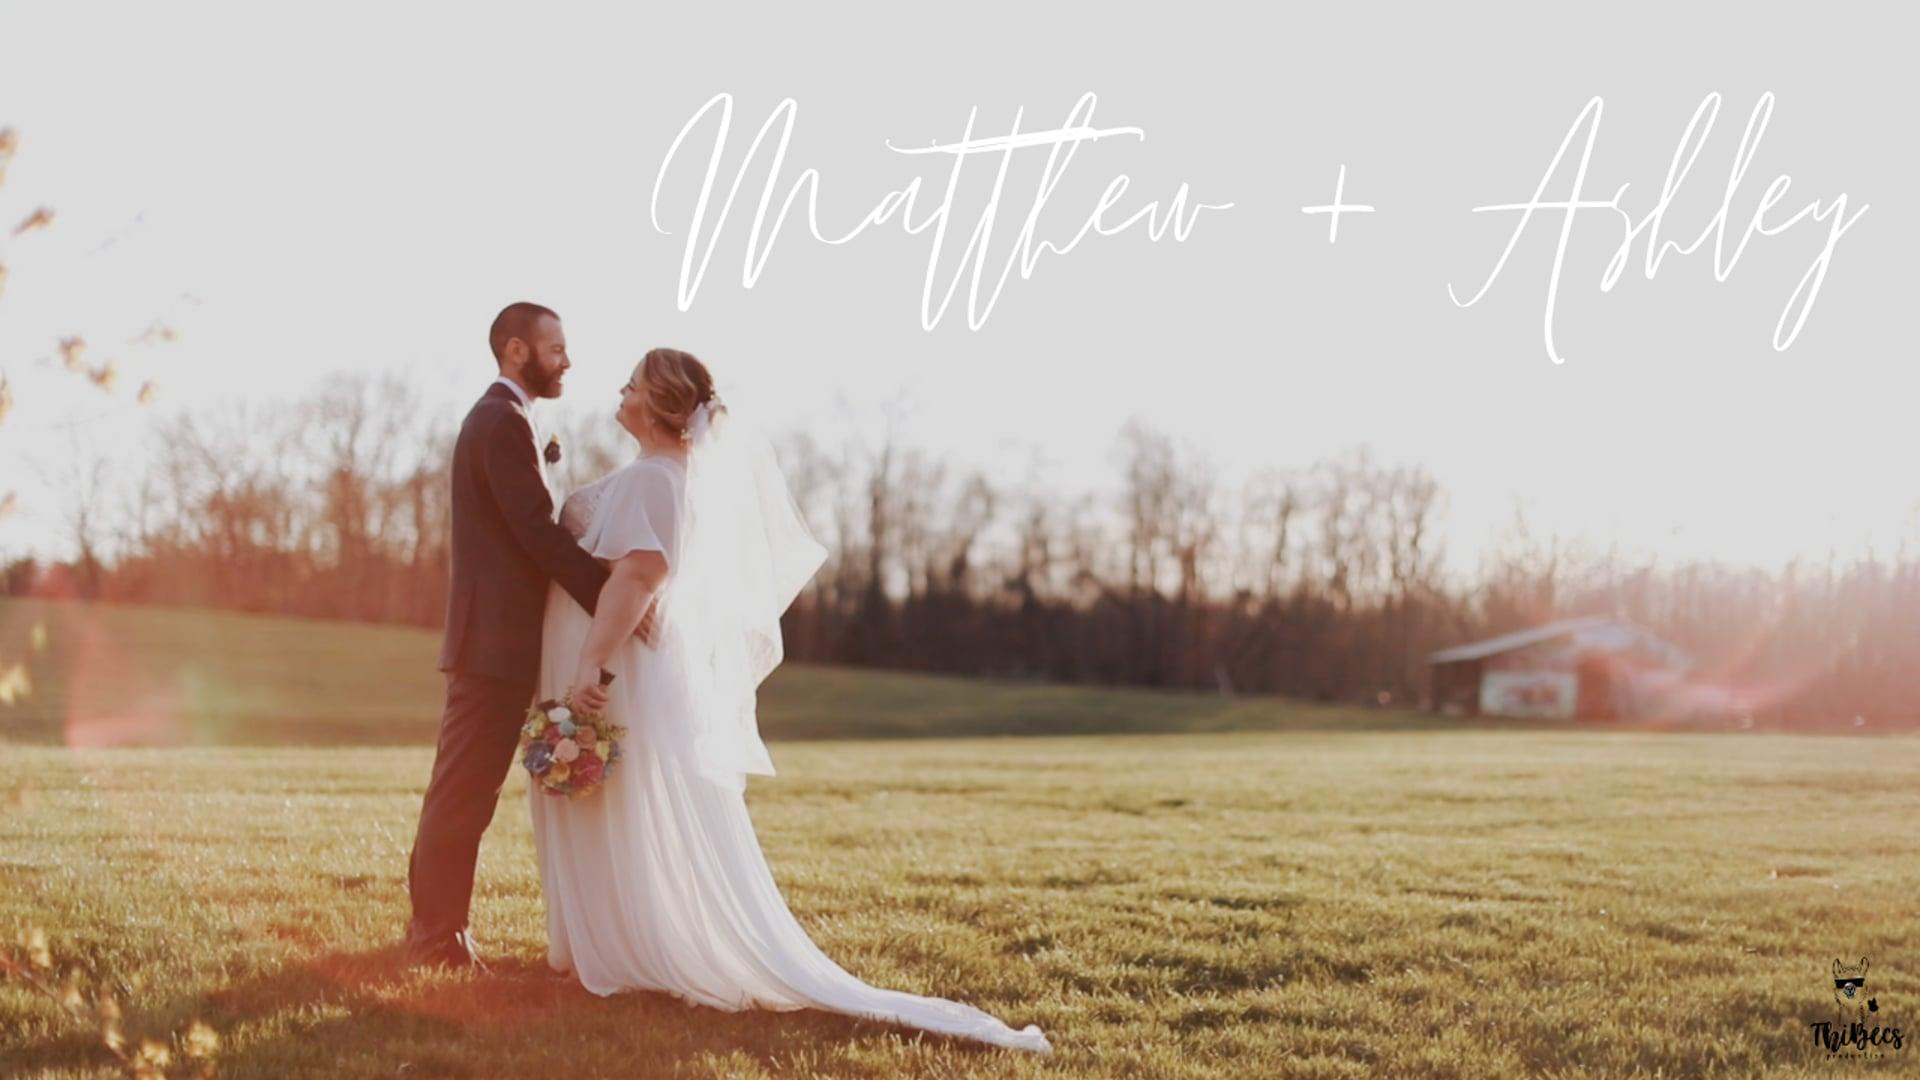 Ashley + Matthew Highlight Video | Palmyra, VA